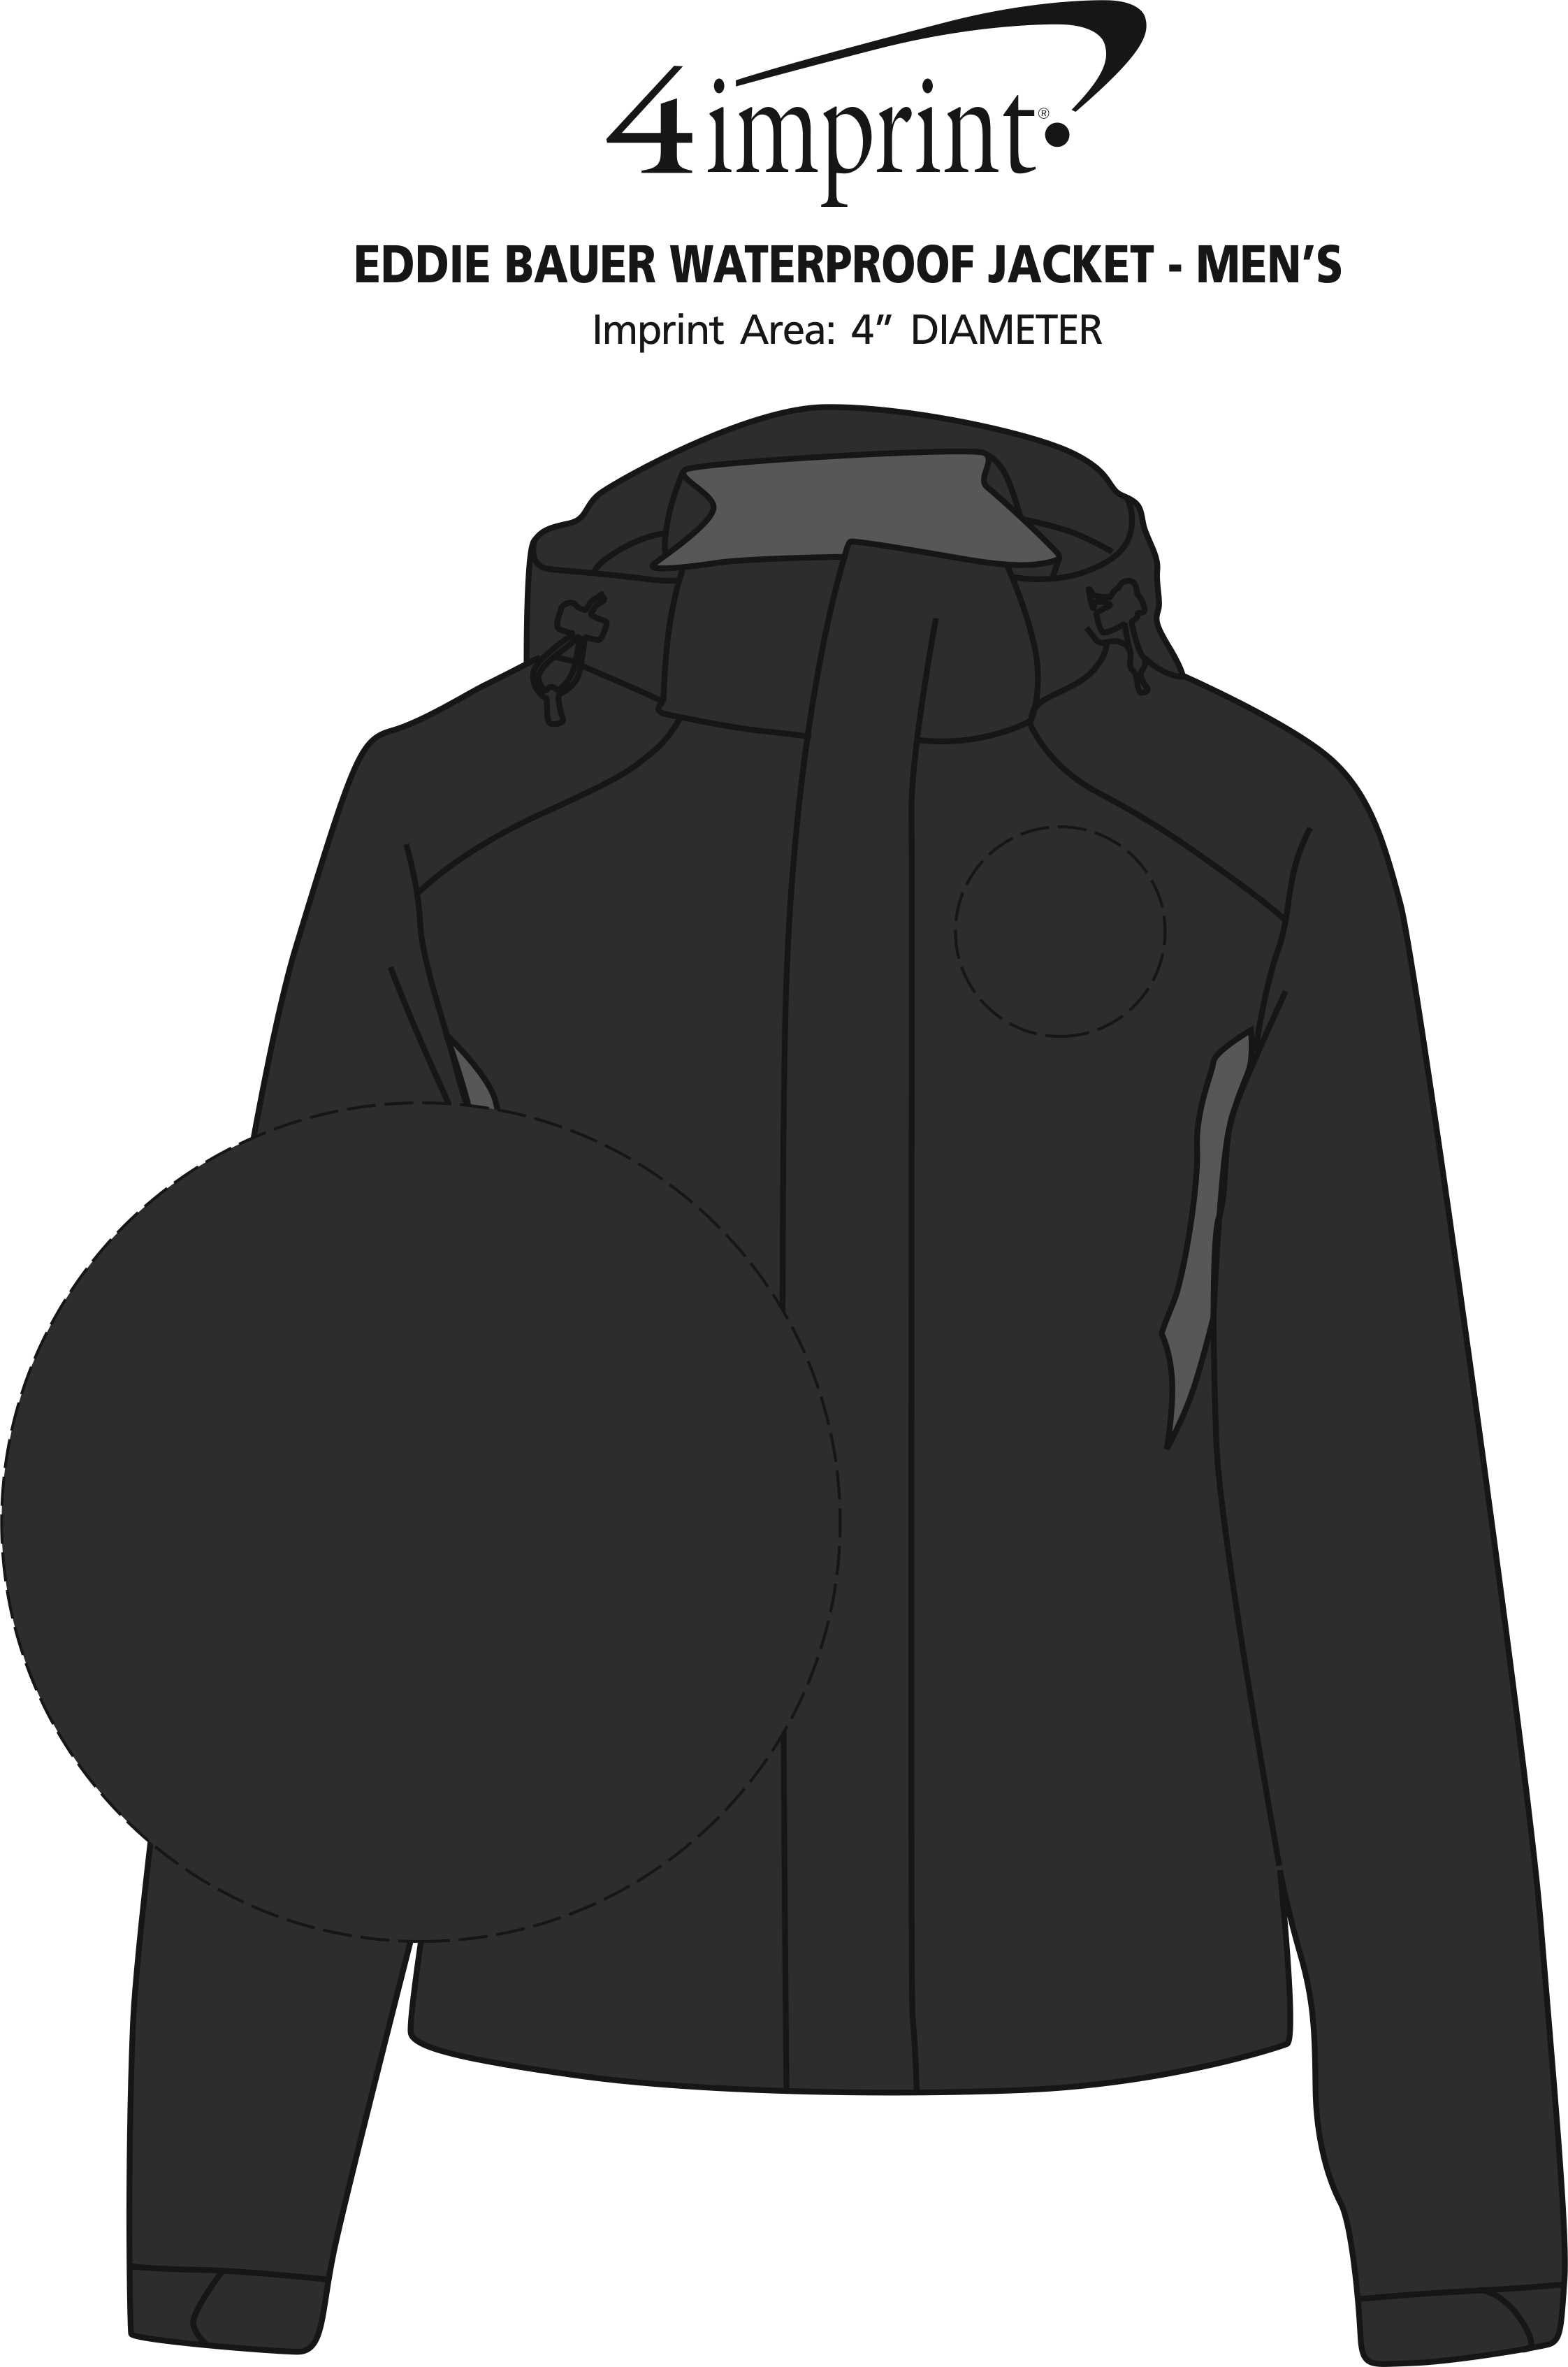 Imprint Area of Eddie Bauer Waterproof Jacket - Men's